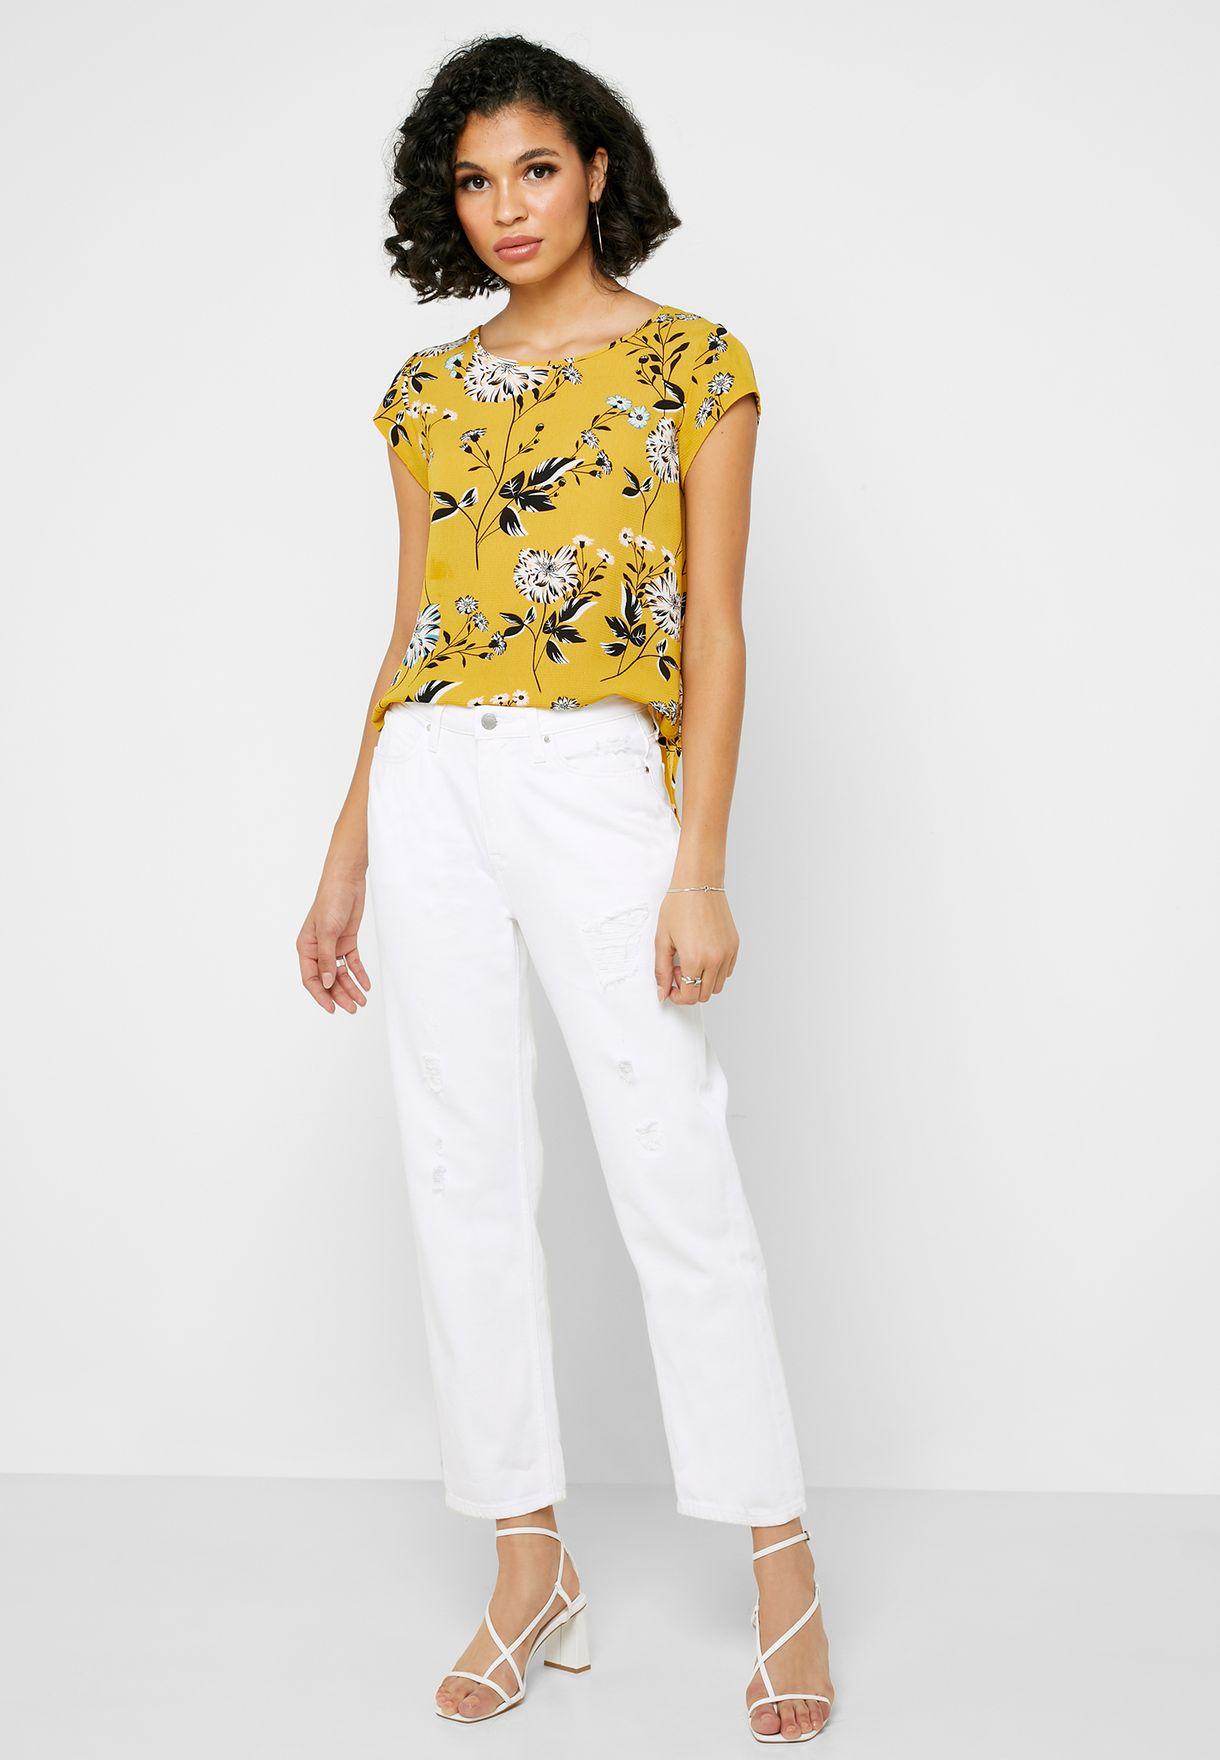 Floral Print Short Sleeve Top